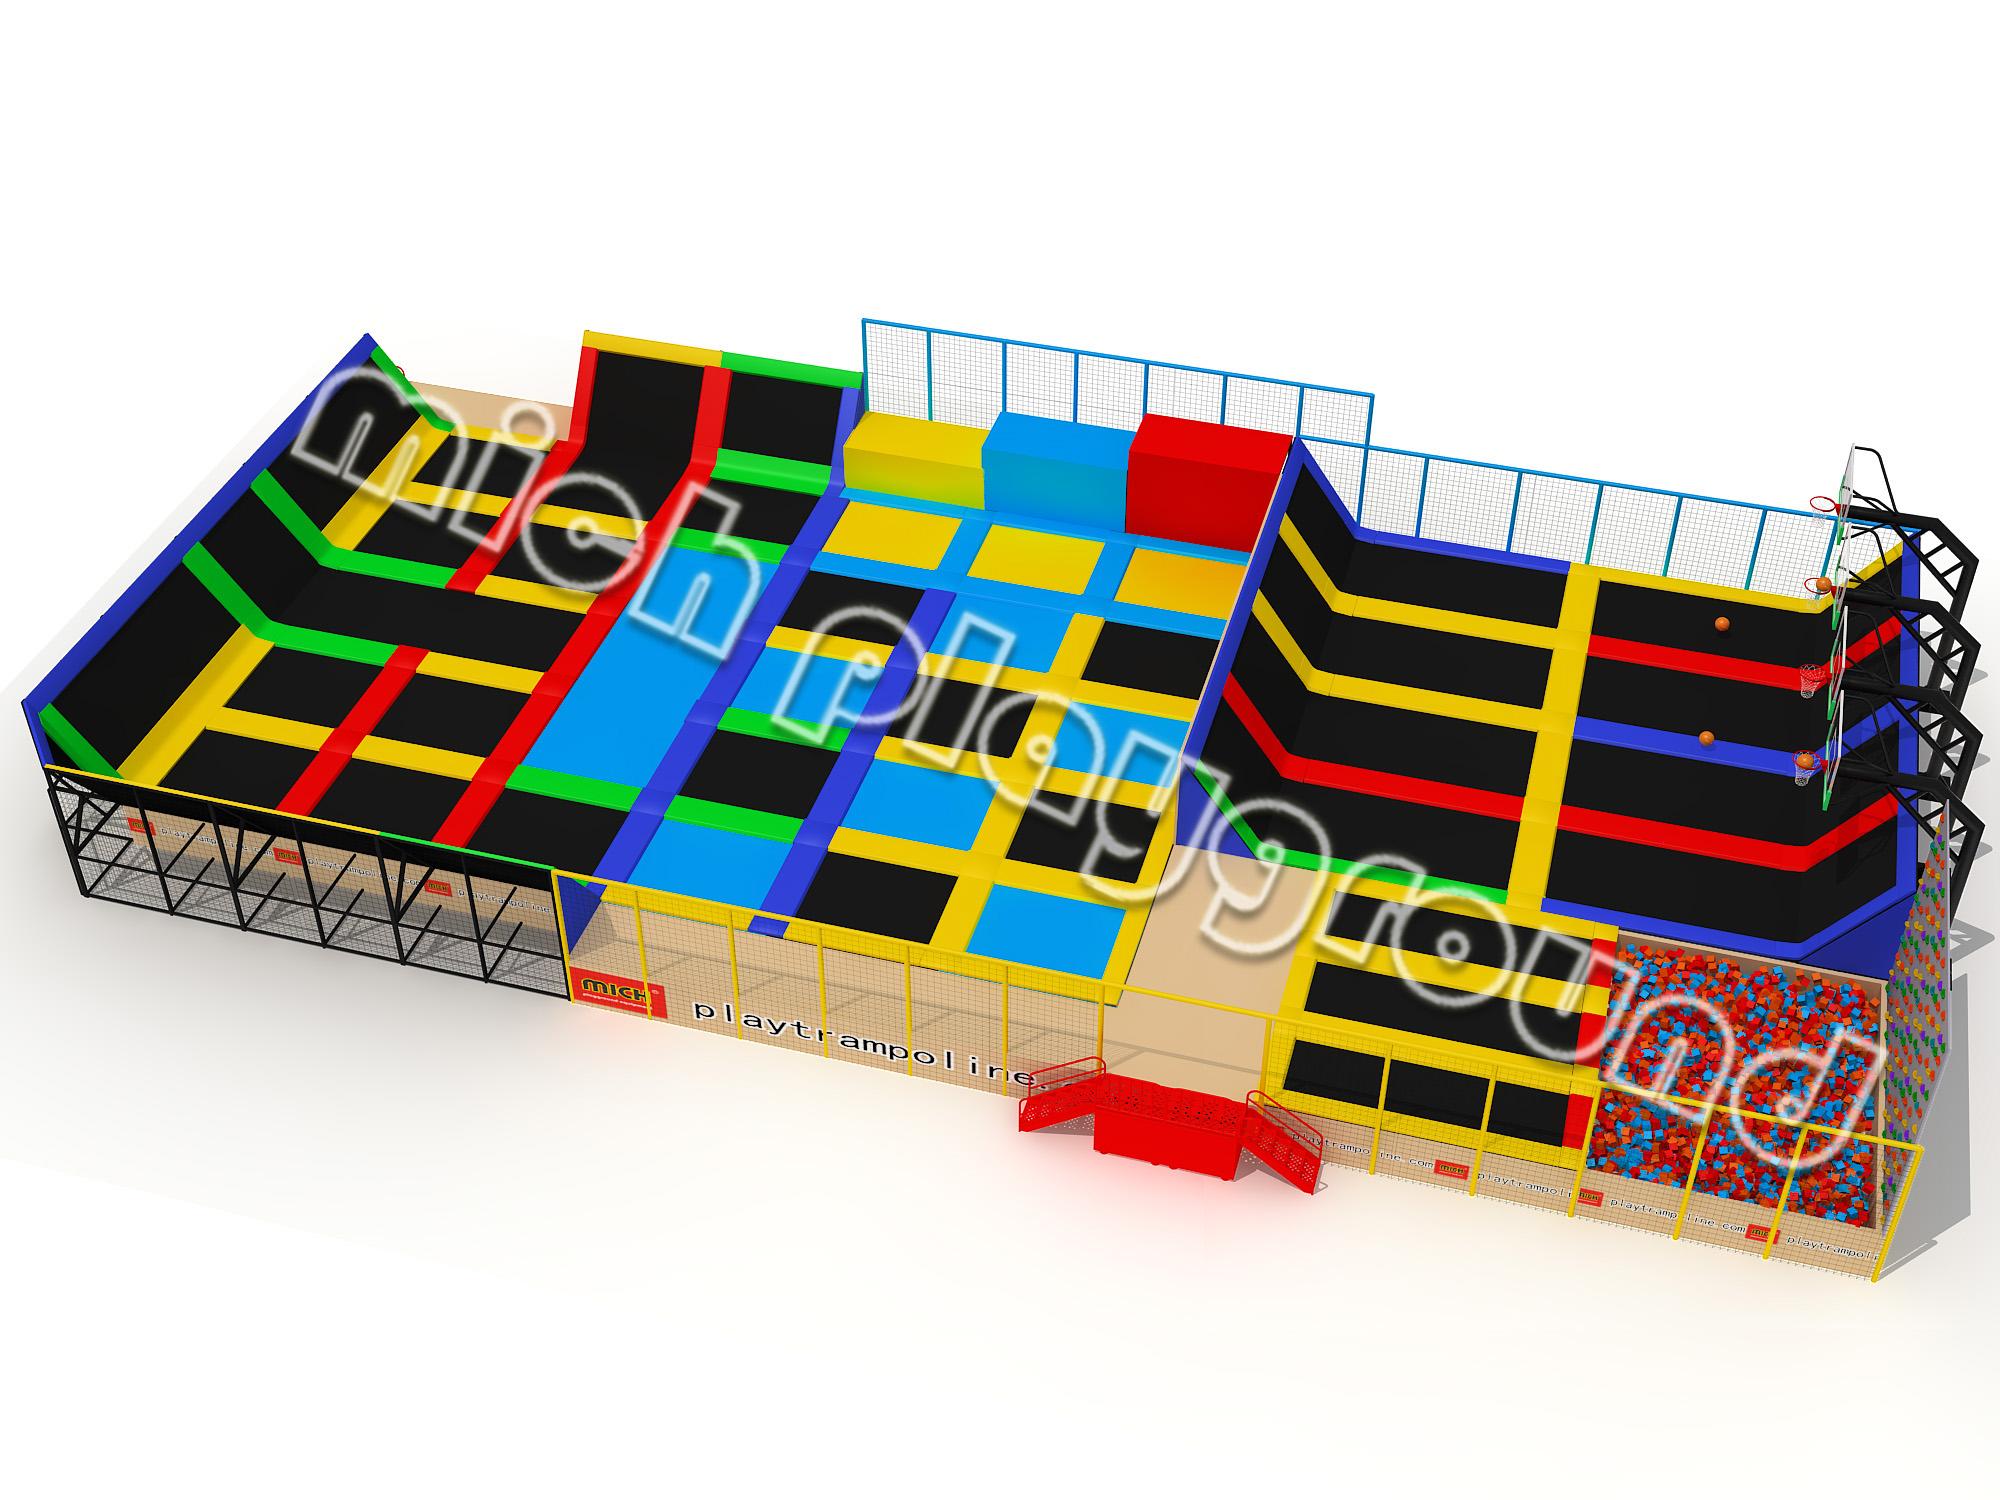 Mich indoor trampoline park design for amusement buy for Indoor trampoline park design manufacturing